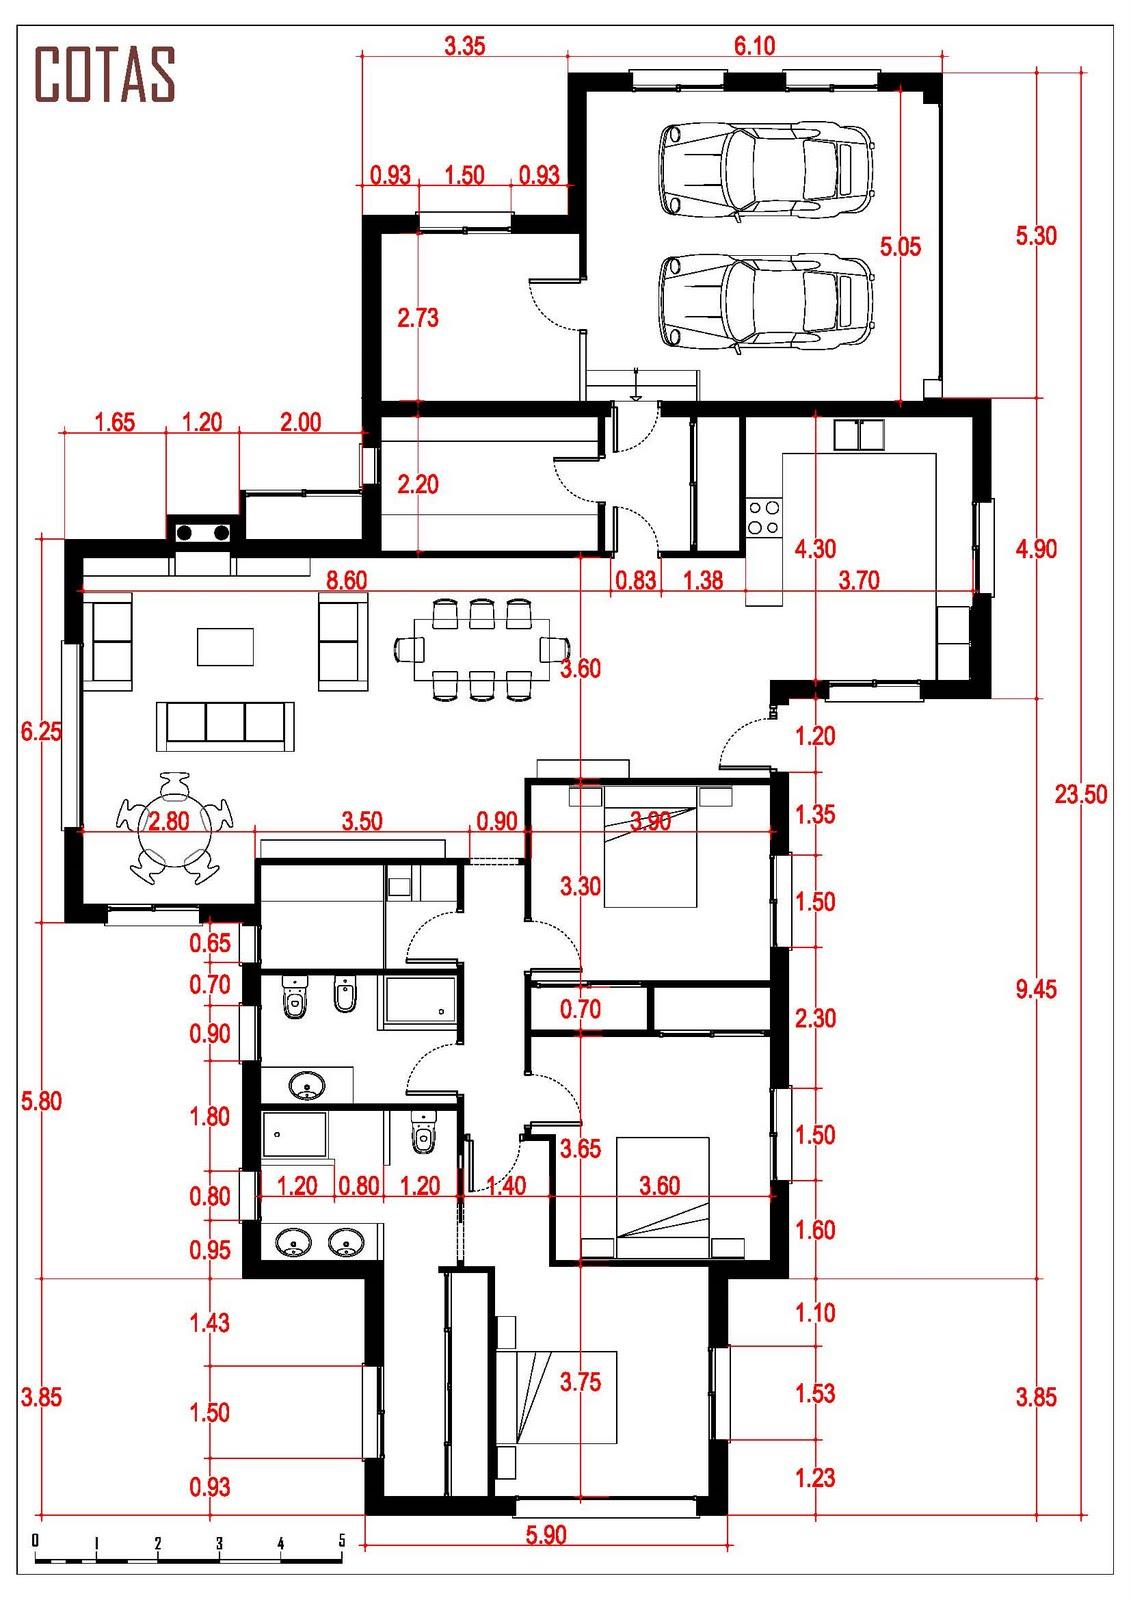 Realizaci n de planos vivienda unifamiliar en las rozas for Planos para viviendas